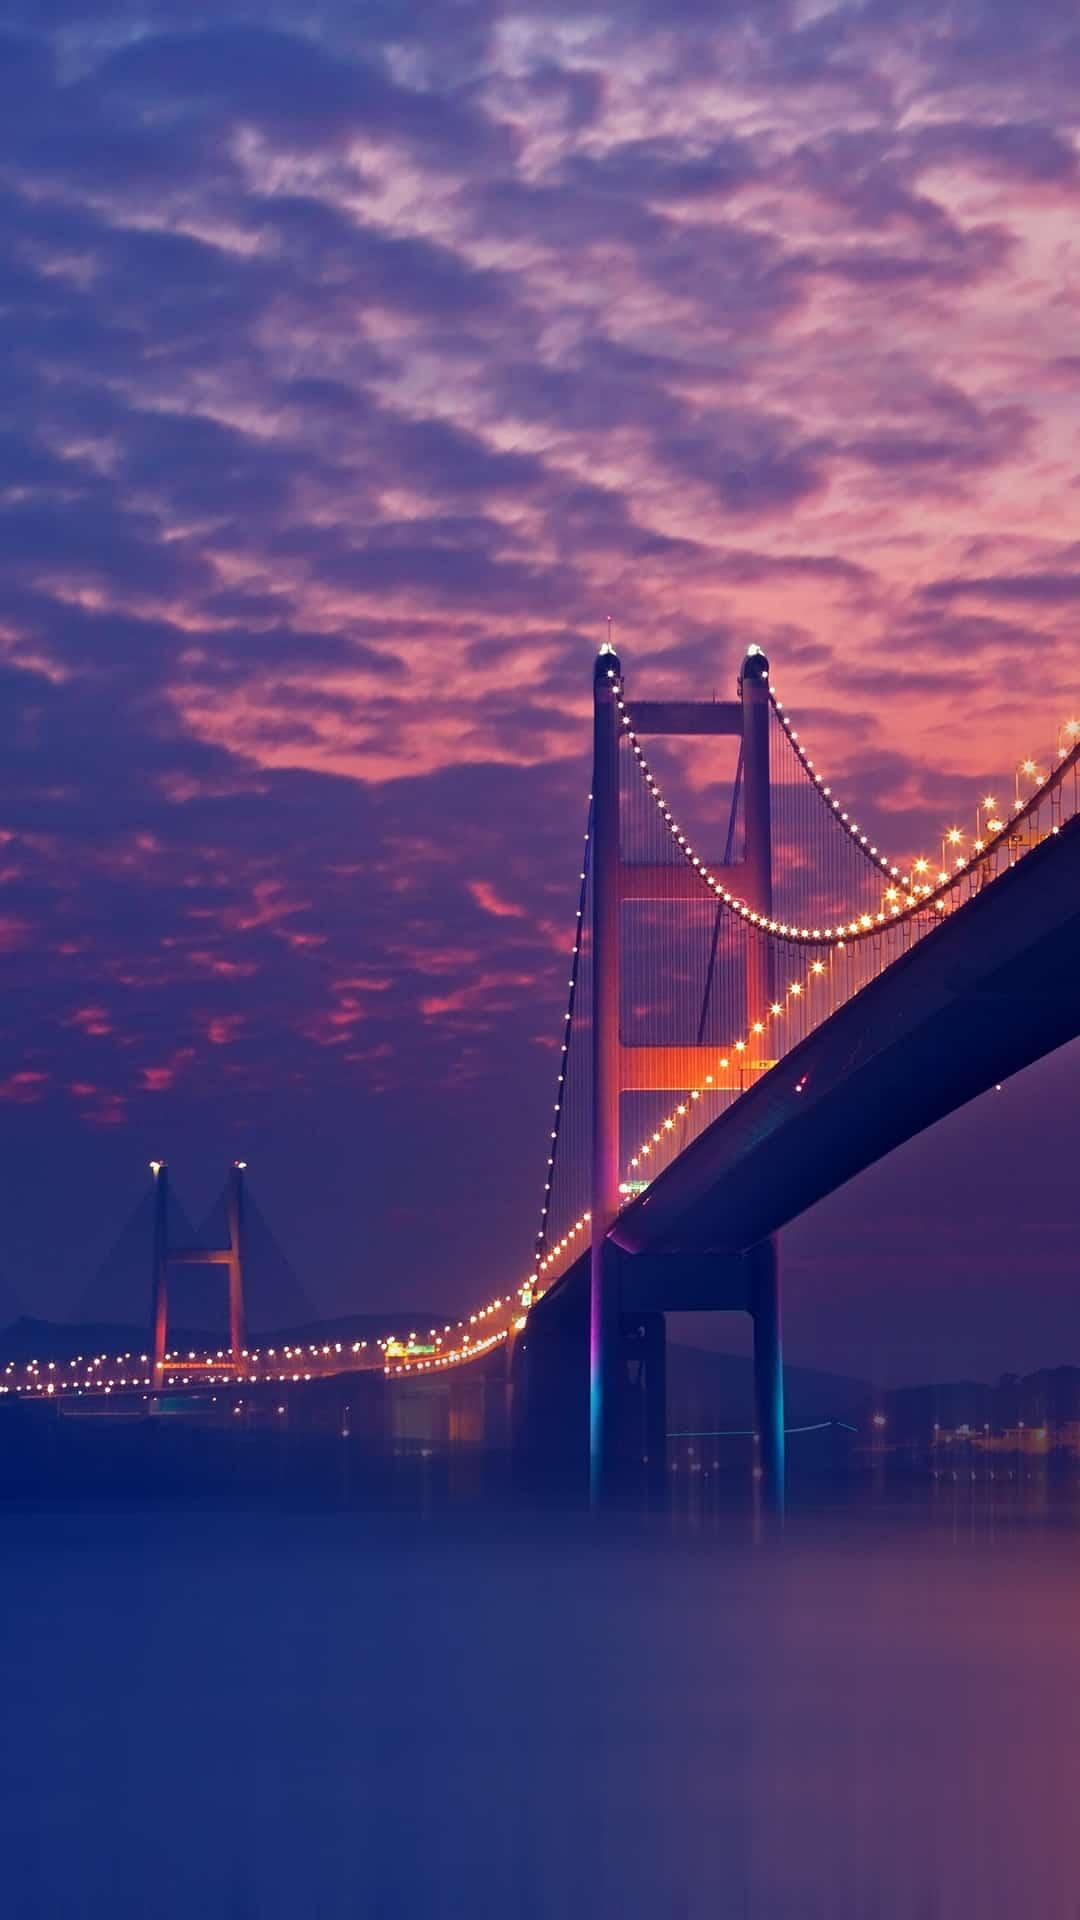 bridge-night-lights-purple-android-wallpaper